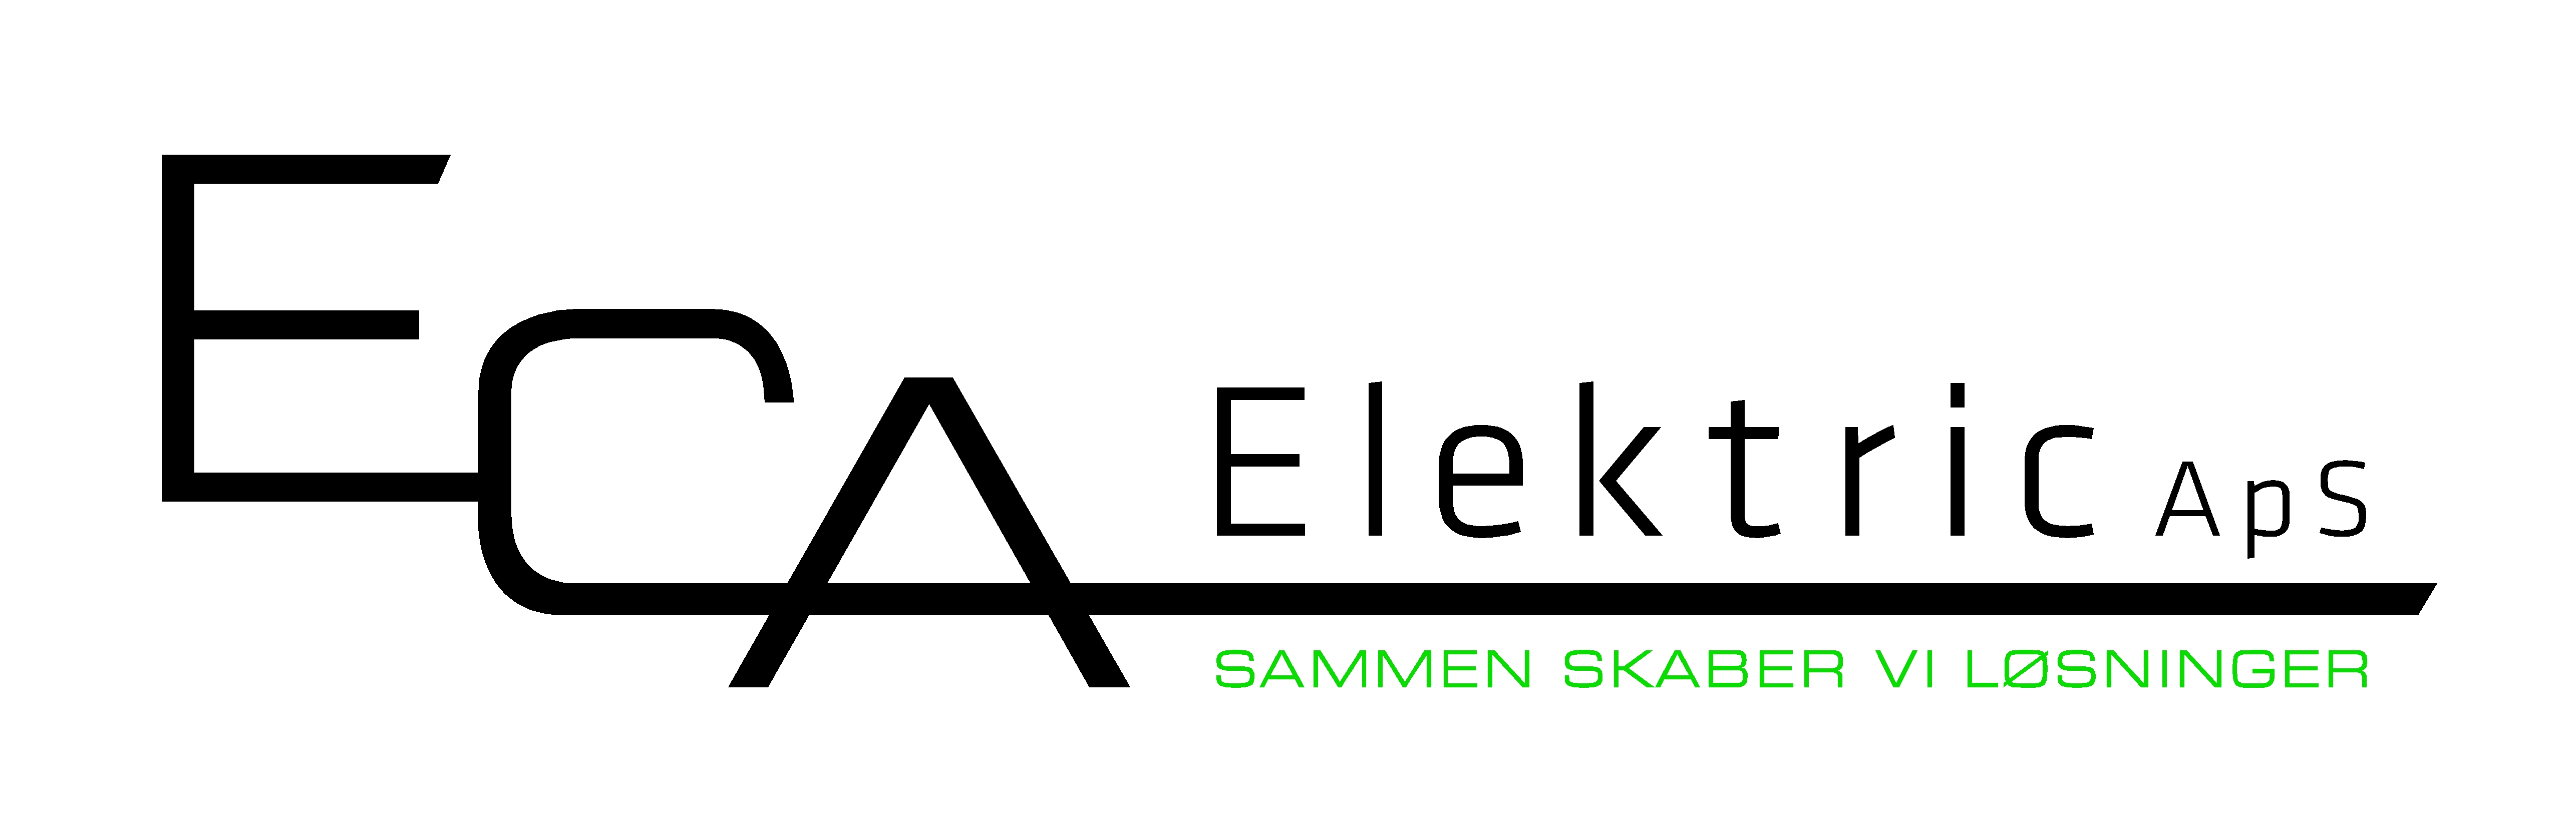 ECA-elektric